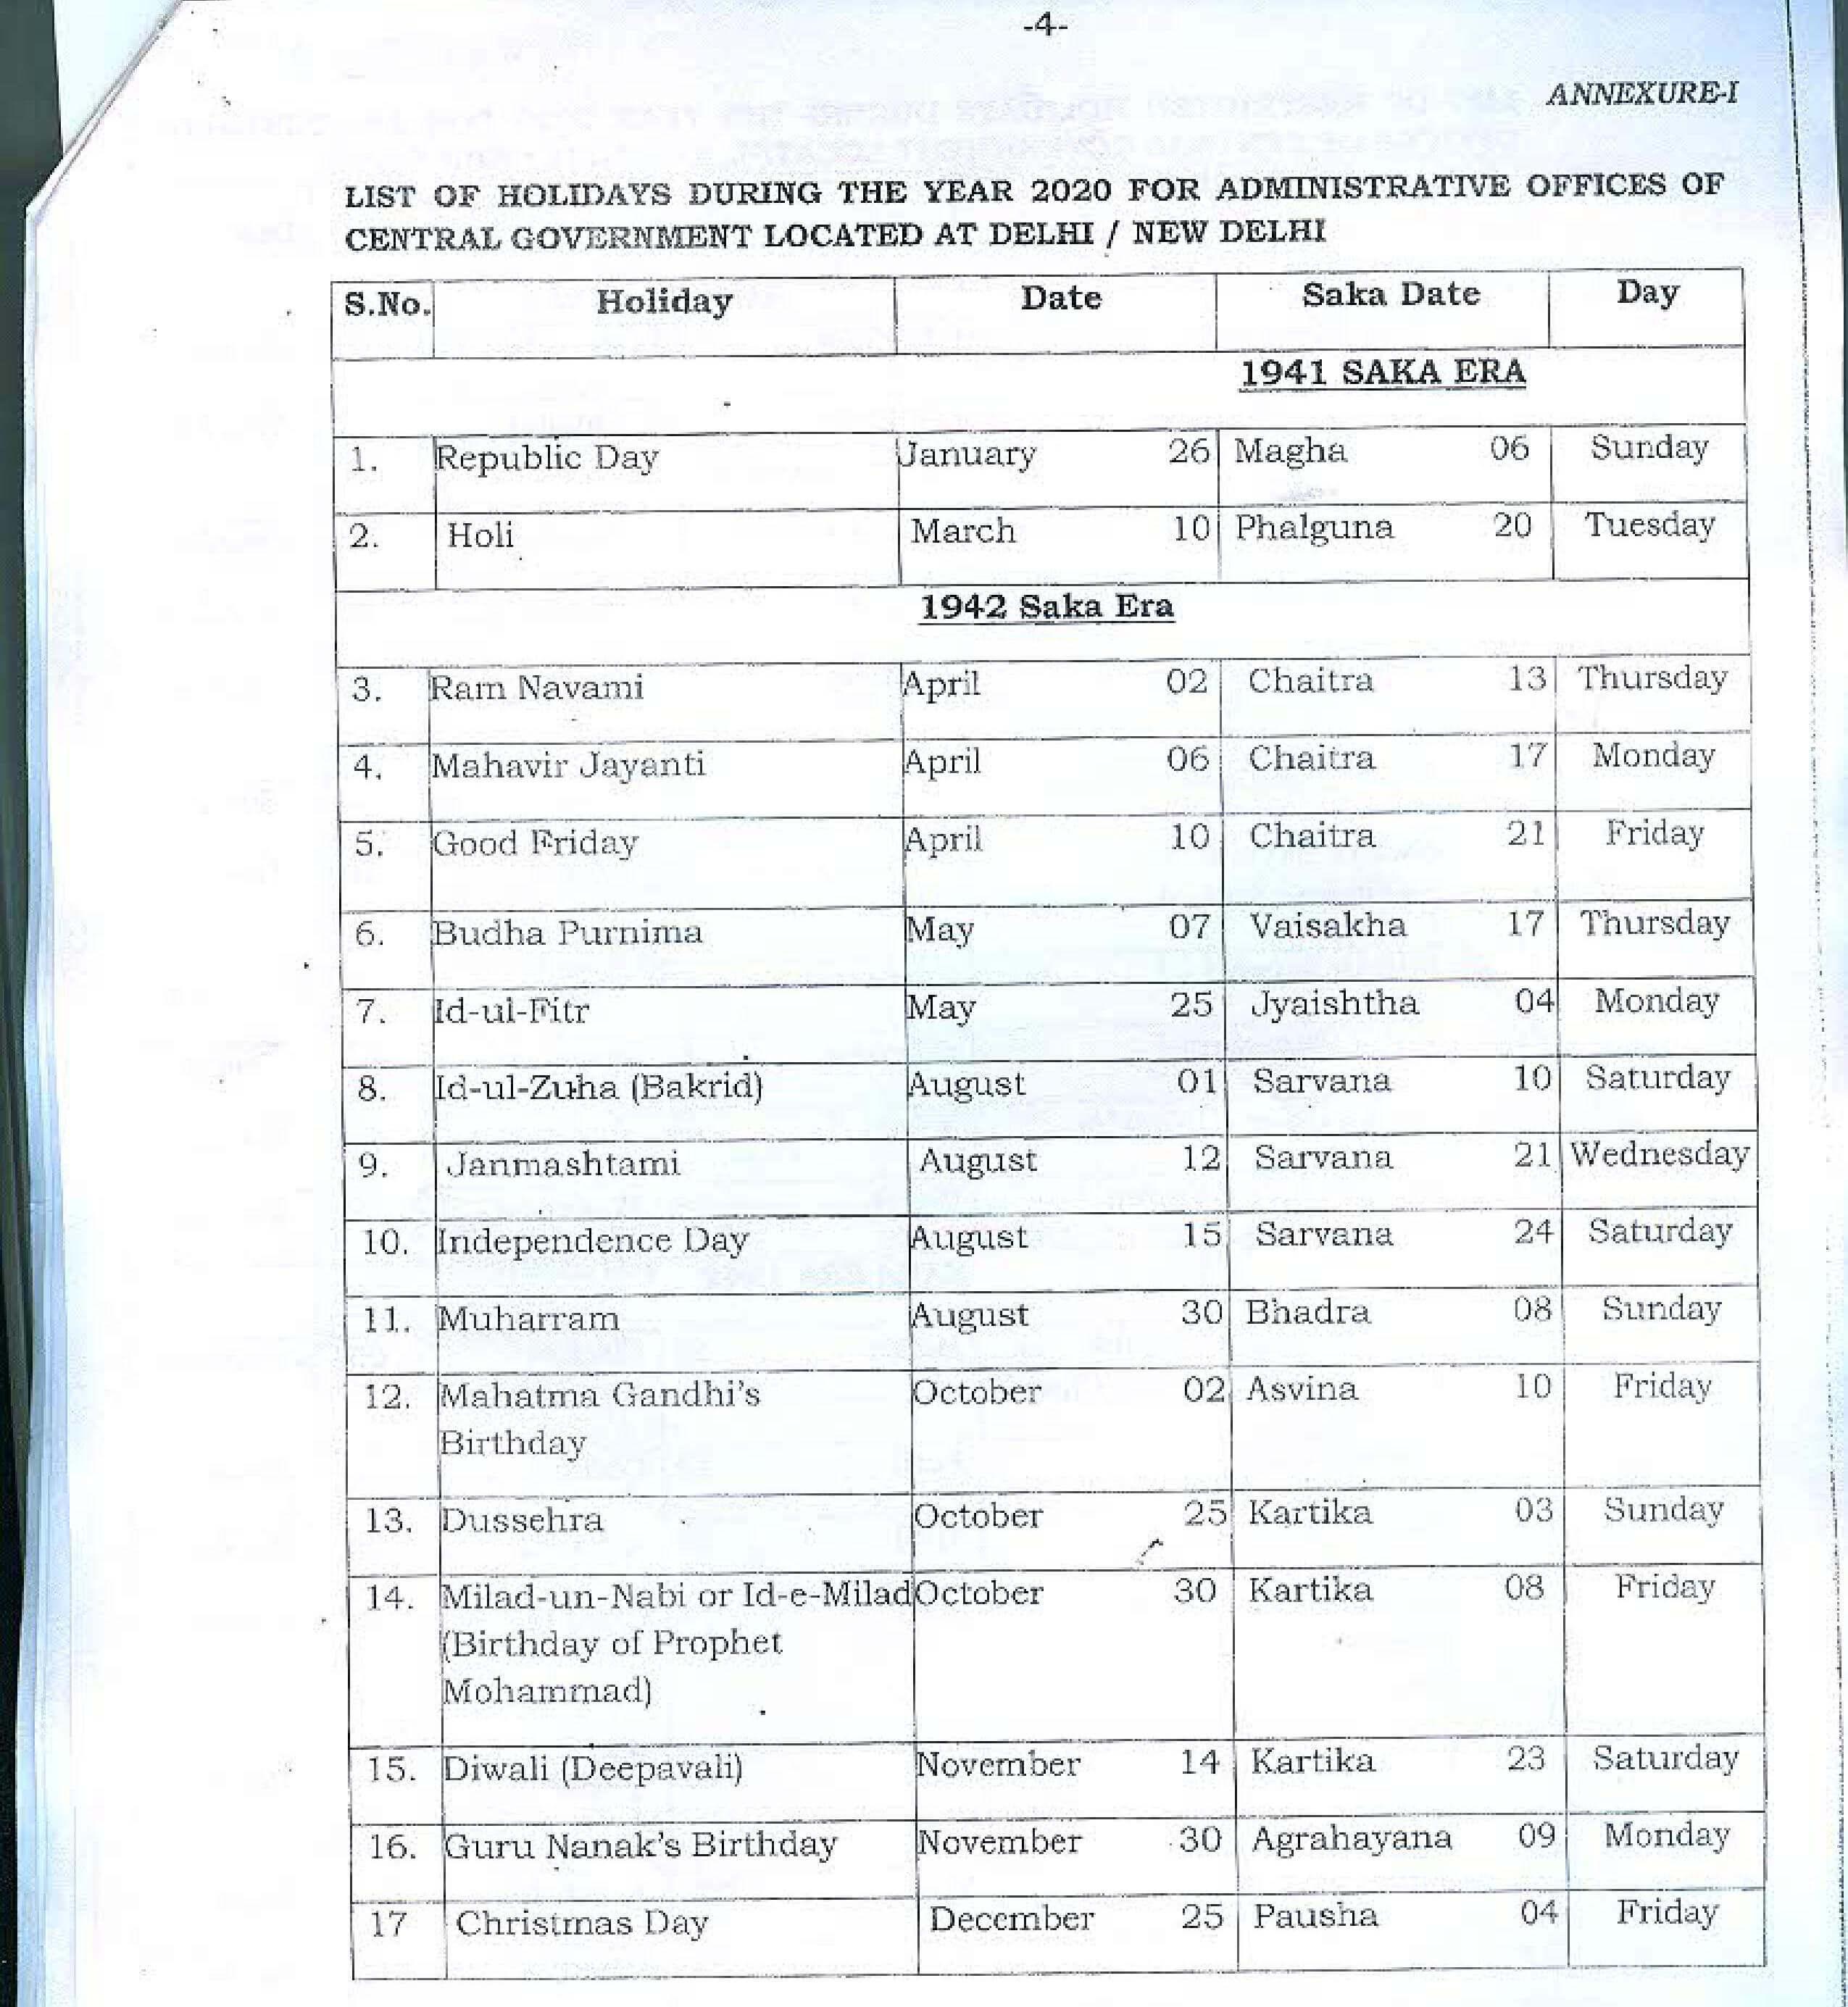 Bsnl Holidays List 2020 | Gazetted And Restricted Holidays regarding Bihar Government Calendar 2020